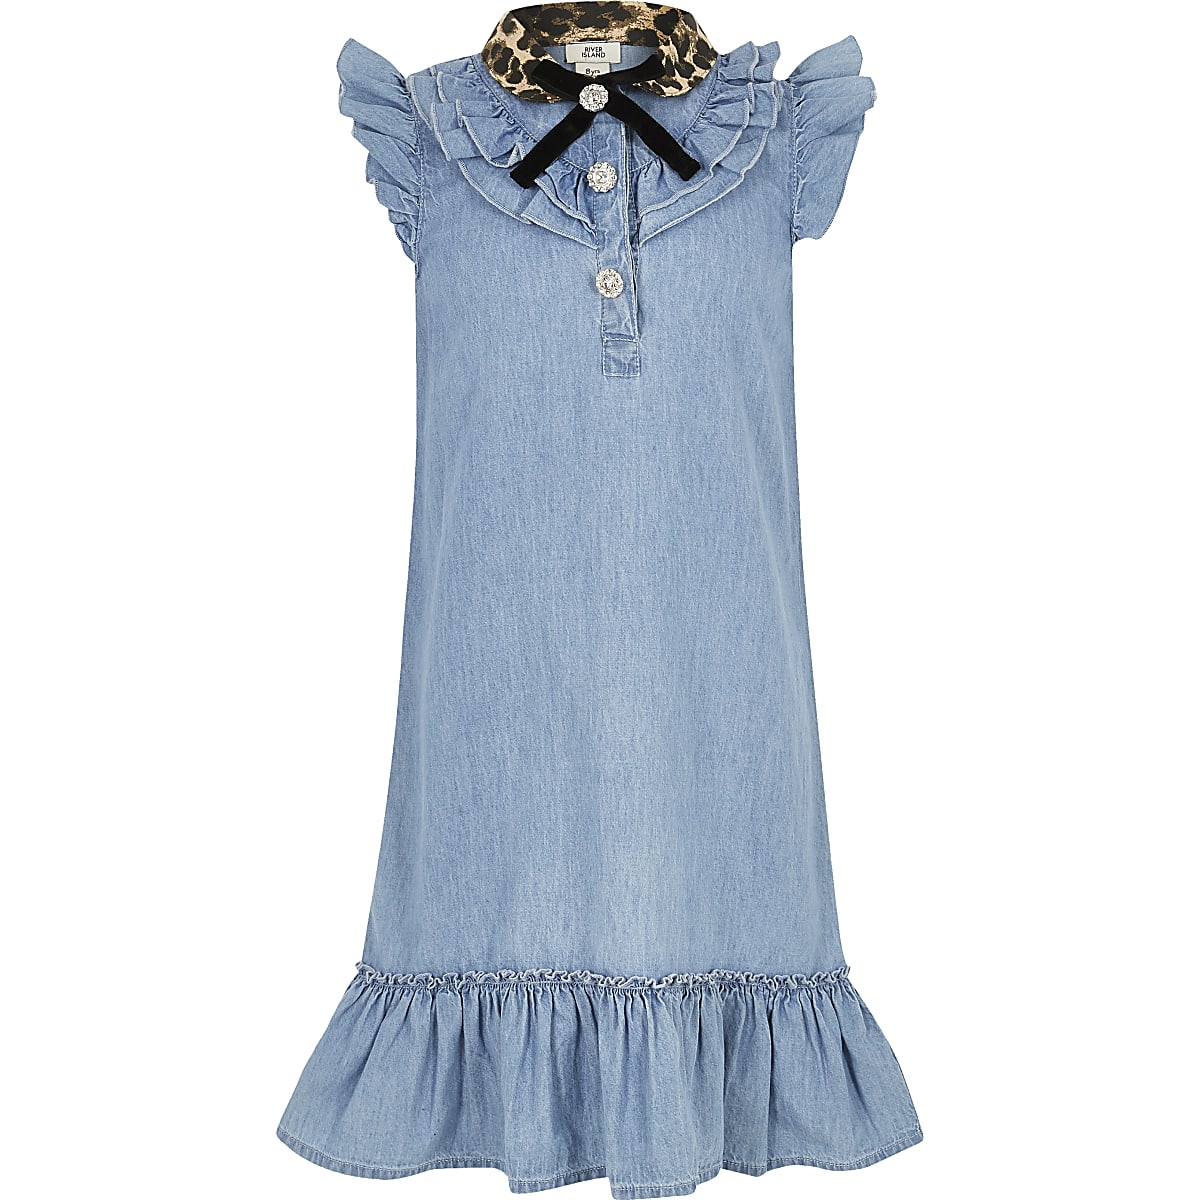 Blauwe denim jurk met luipaardprinthals voor meisjes